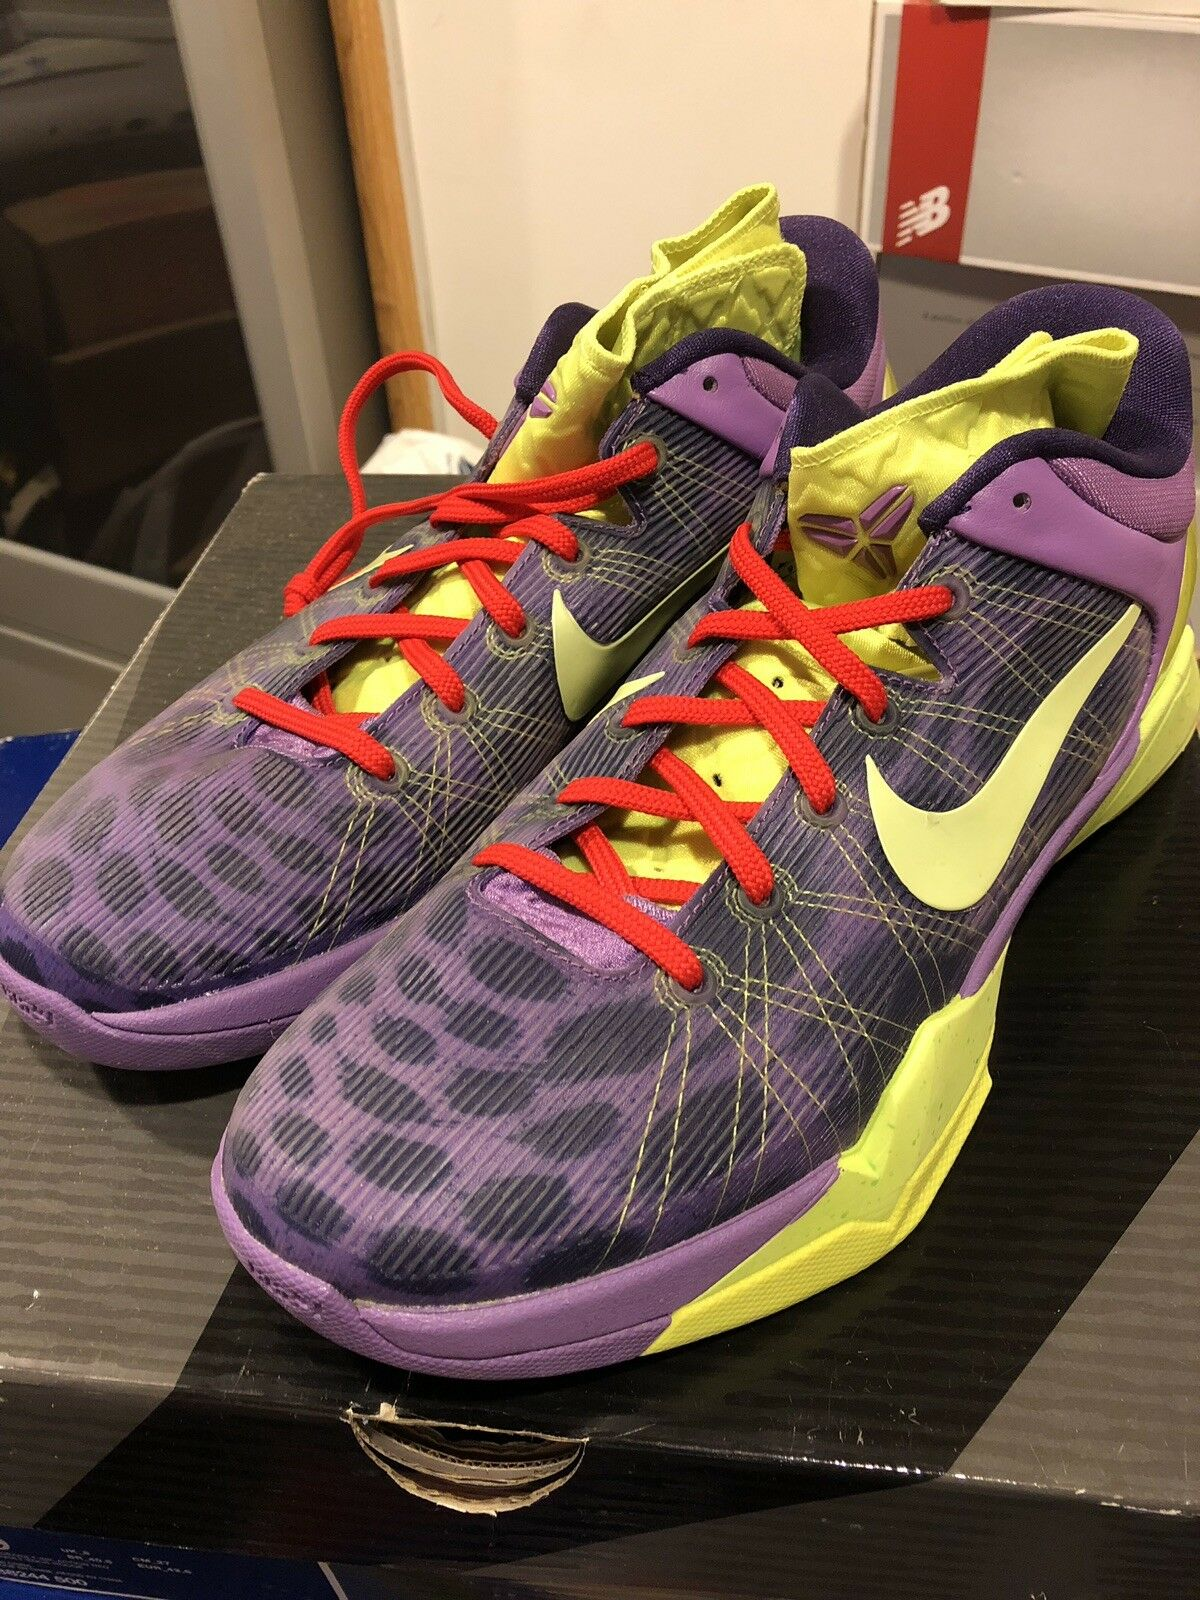 8cac7ad262d9 Nike Kobe Kobe Kobe 7 Vii Cheetah 6 Vi Grinch SB Supreme Galaxy Giuseppe  Yeezy Jordan